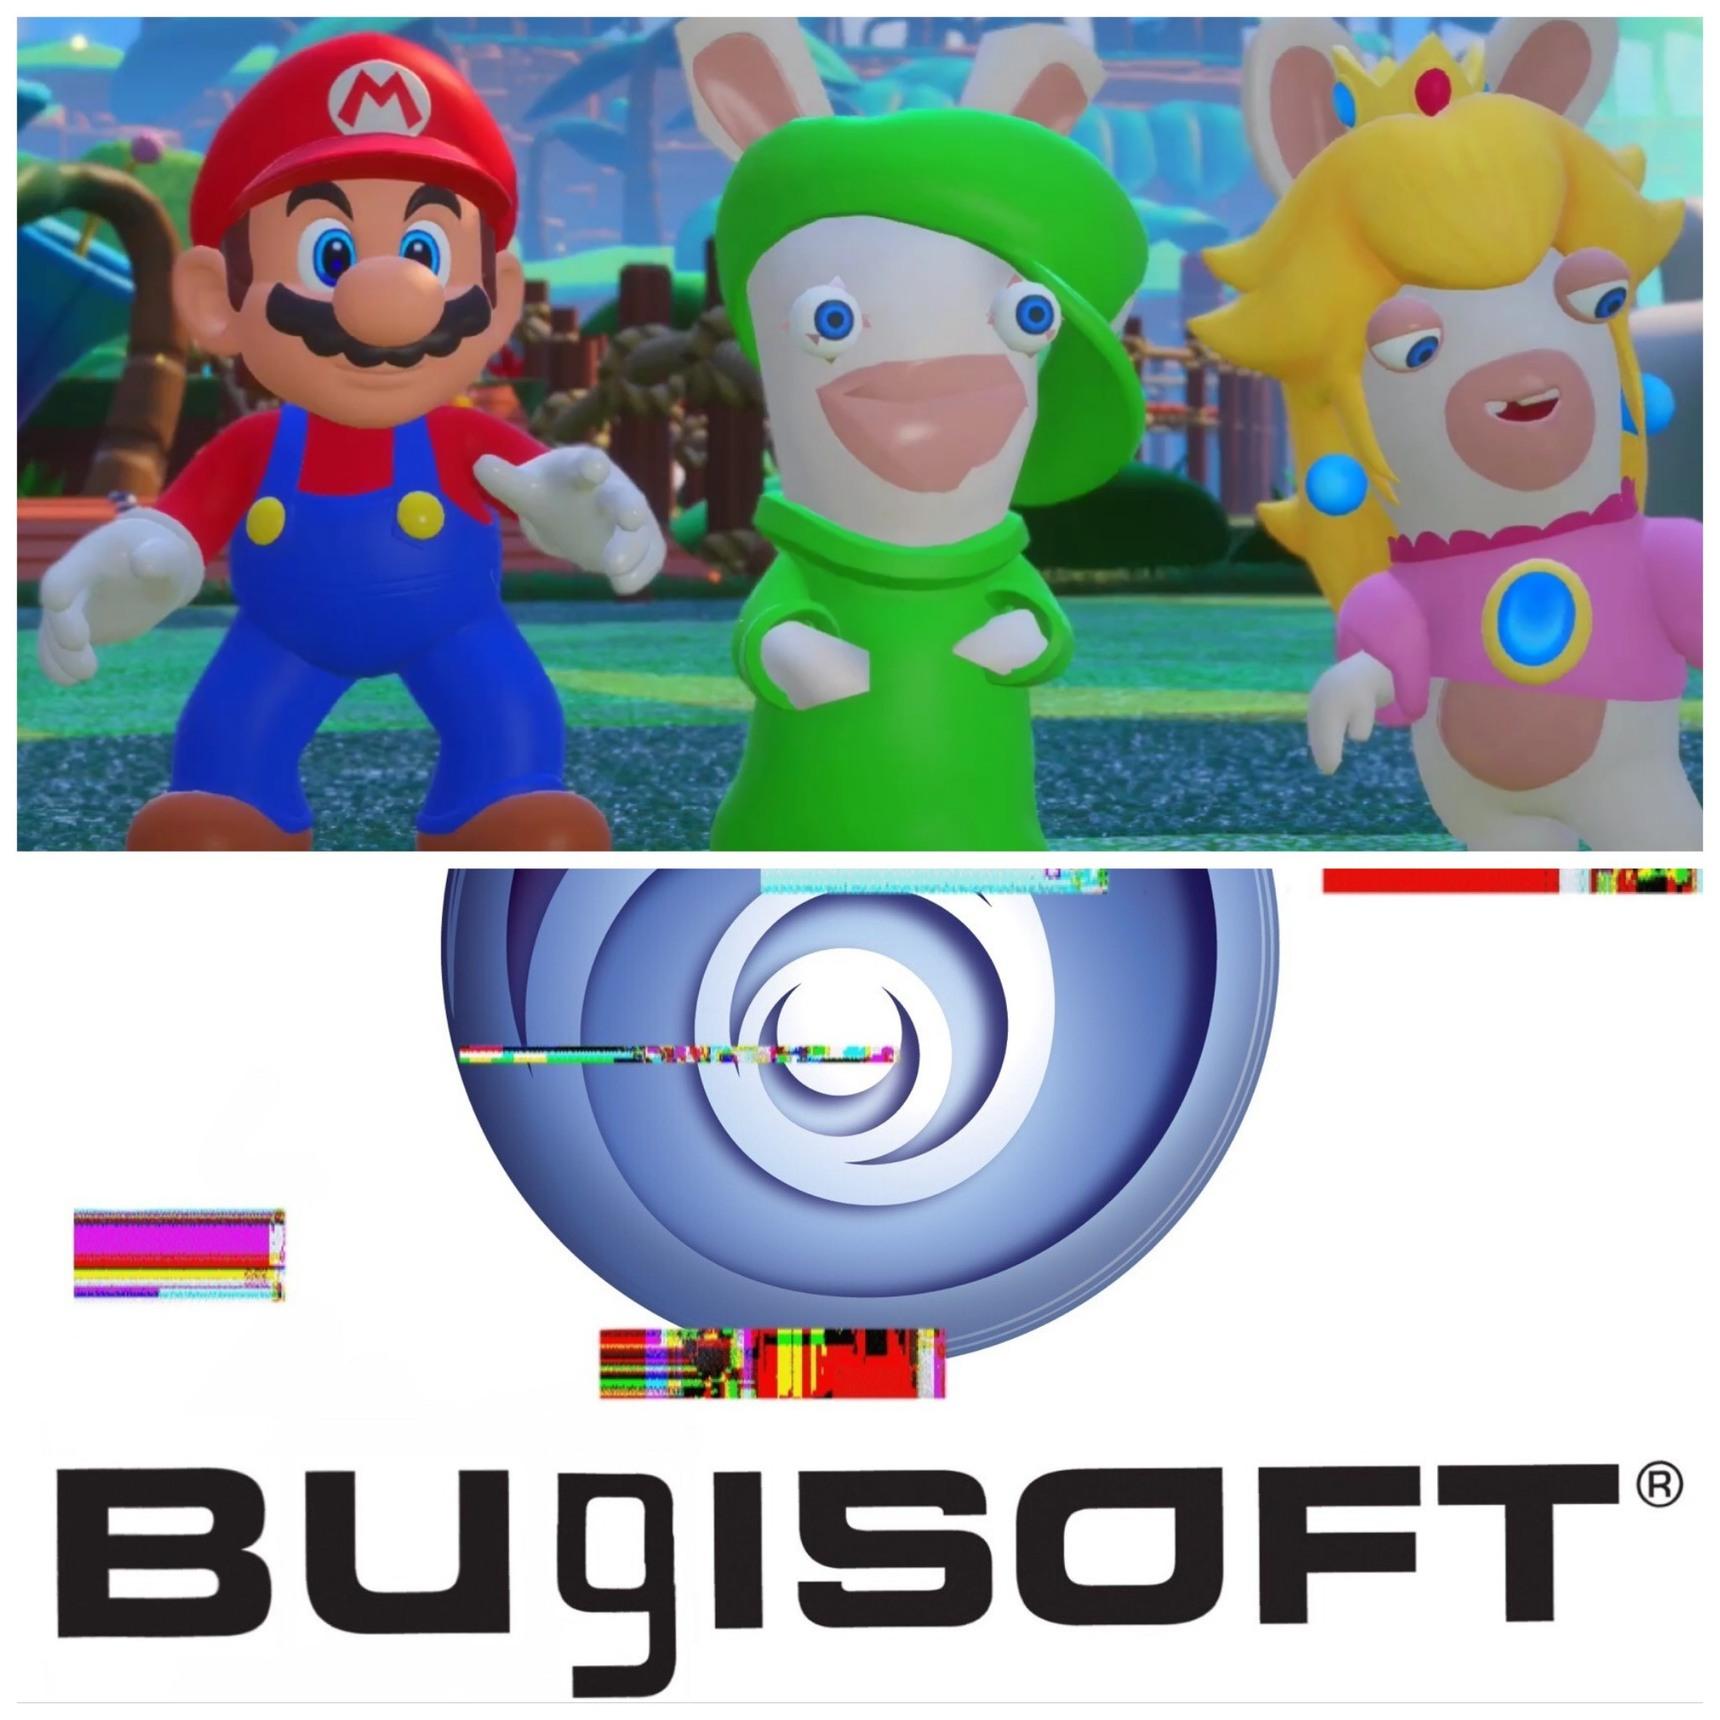 Miren a Rabbit-Luigi - meme